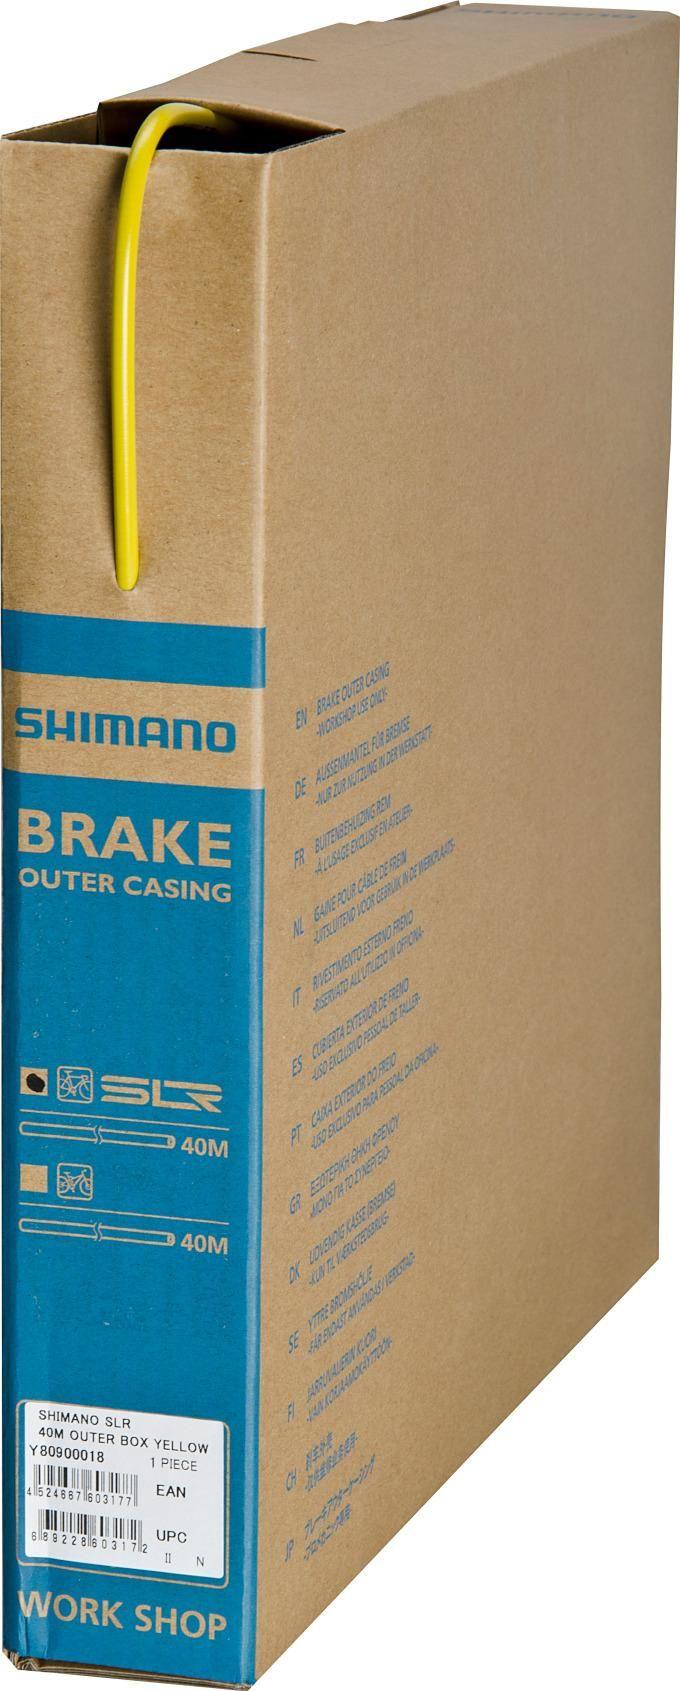 Запчасть Shimano оплетка троса тормоза SLR (Y80900018) оплетка тормоза shimano slr 40м в коробке цвет желтый y80900018